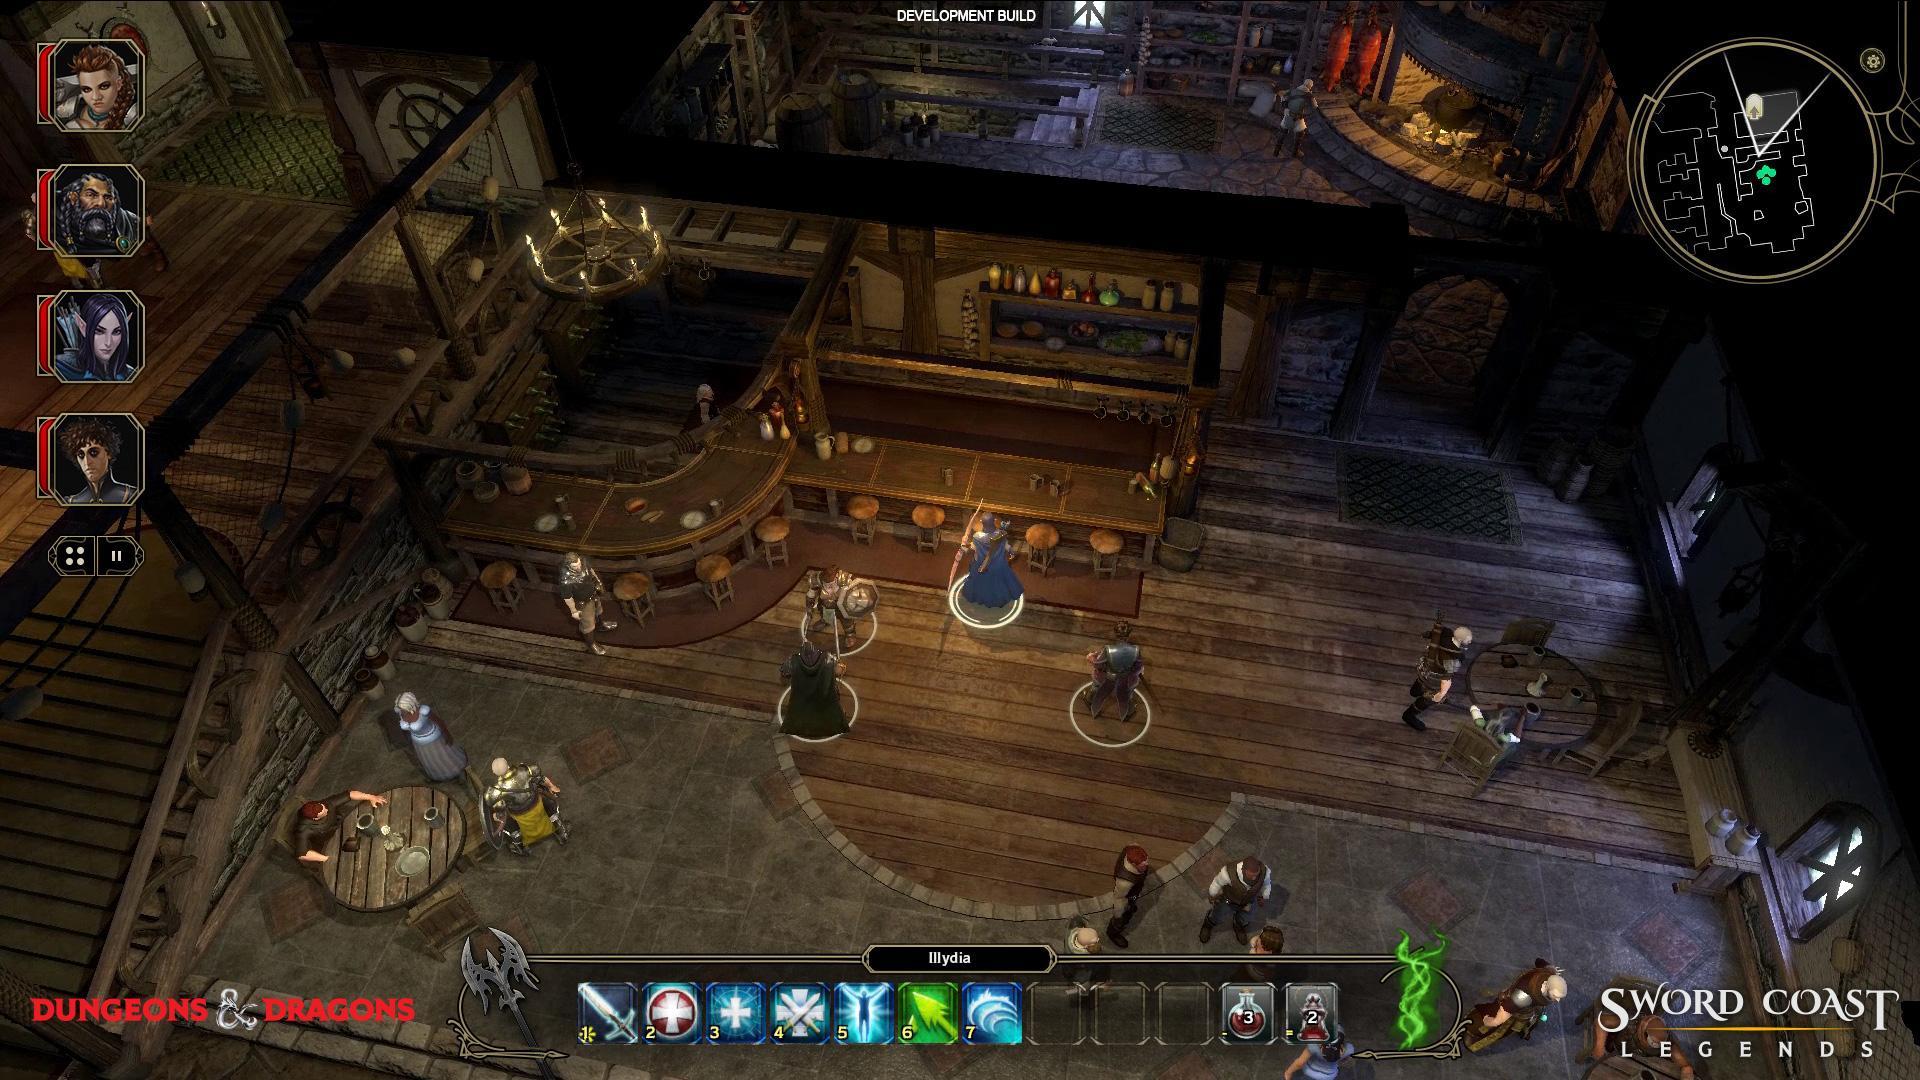 Neverwinter Nights: Pirates of the Sword Coast 2005 pc game Img-1